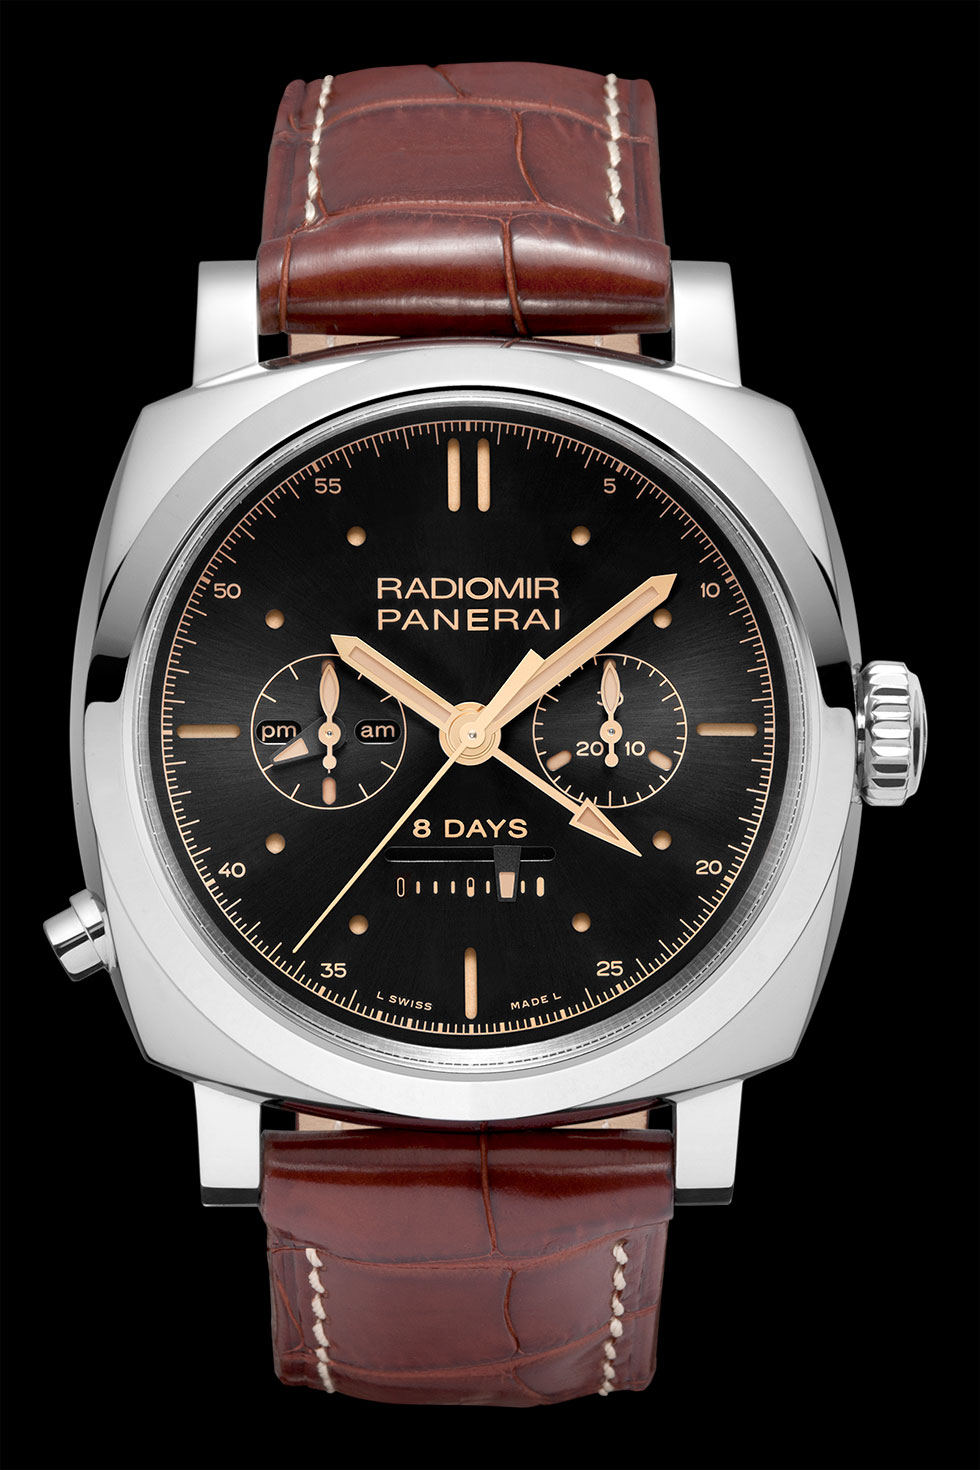 часы Panerai Radiomir 1940 Chrono Monopulsante 8 Days GMT Oro Bianco